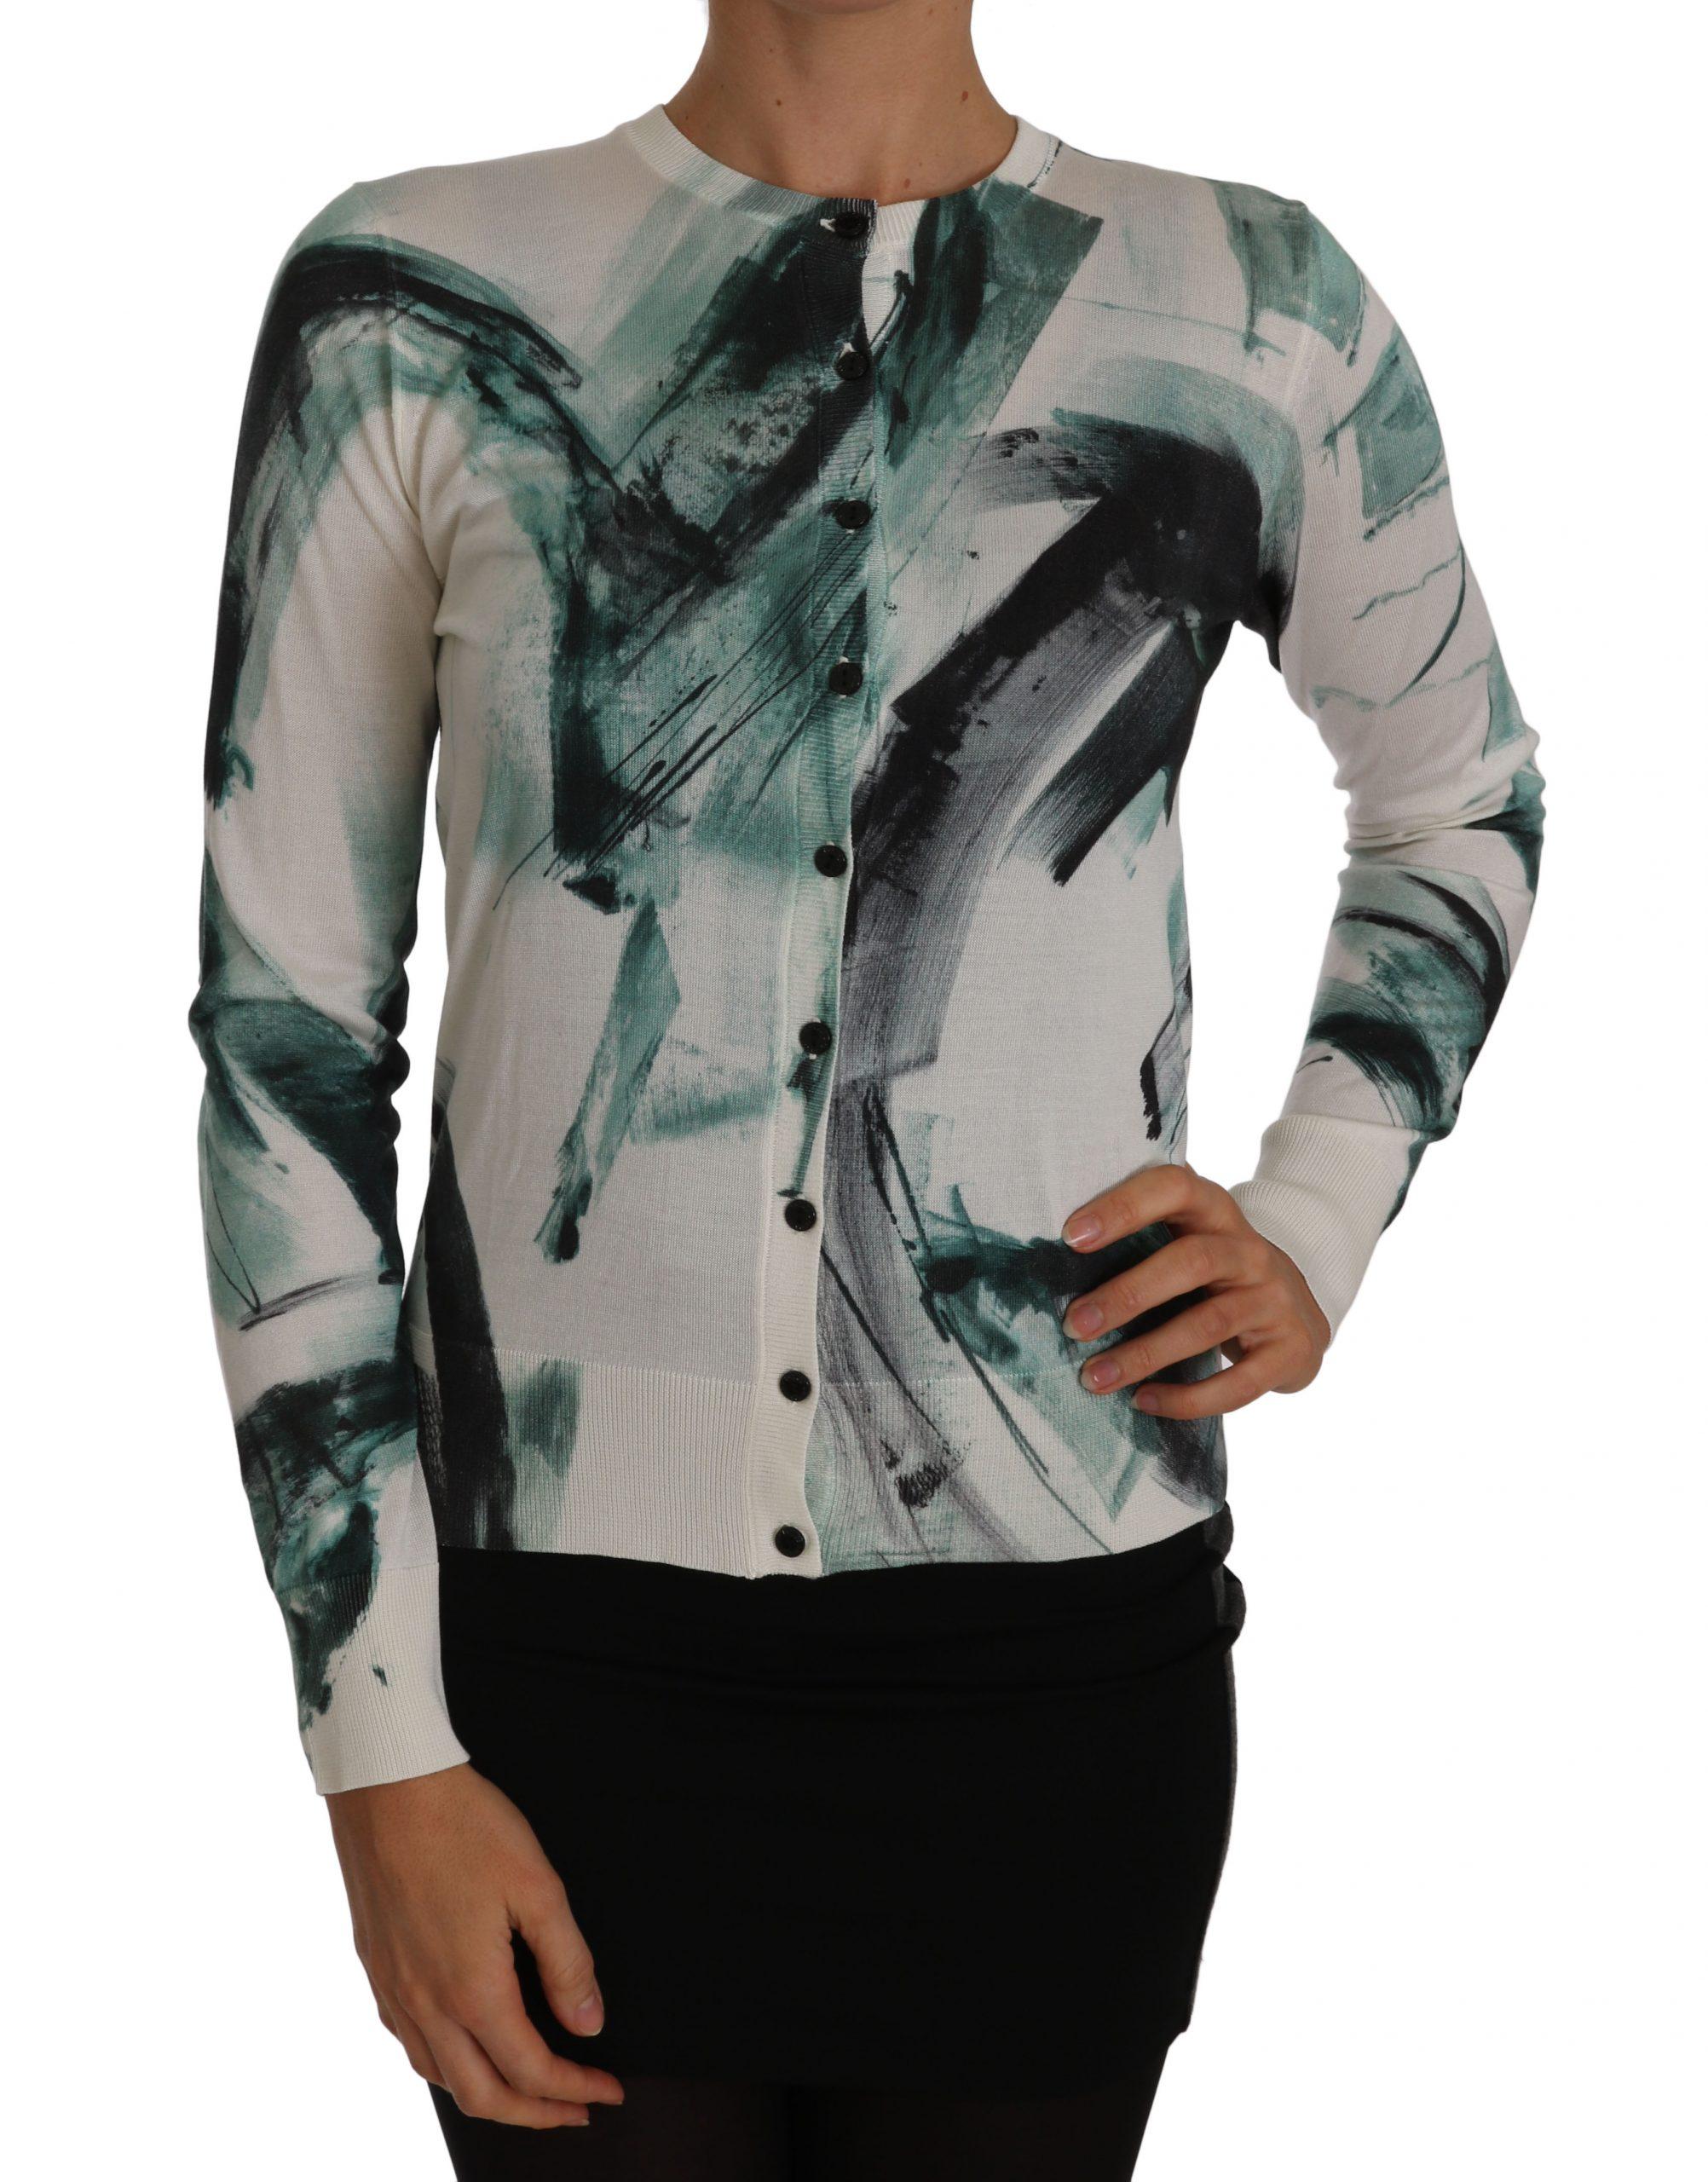 Dolce & Gabbana Women's Slk Lightweight Paint Stroke Cardigan White TSH2441 - IT36   XS